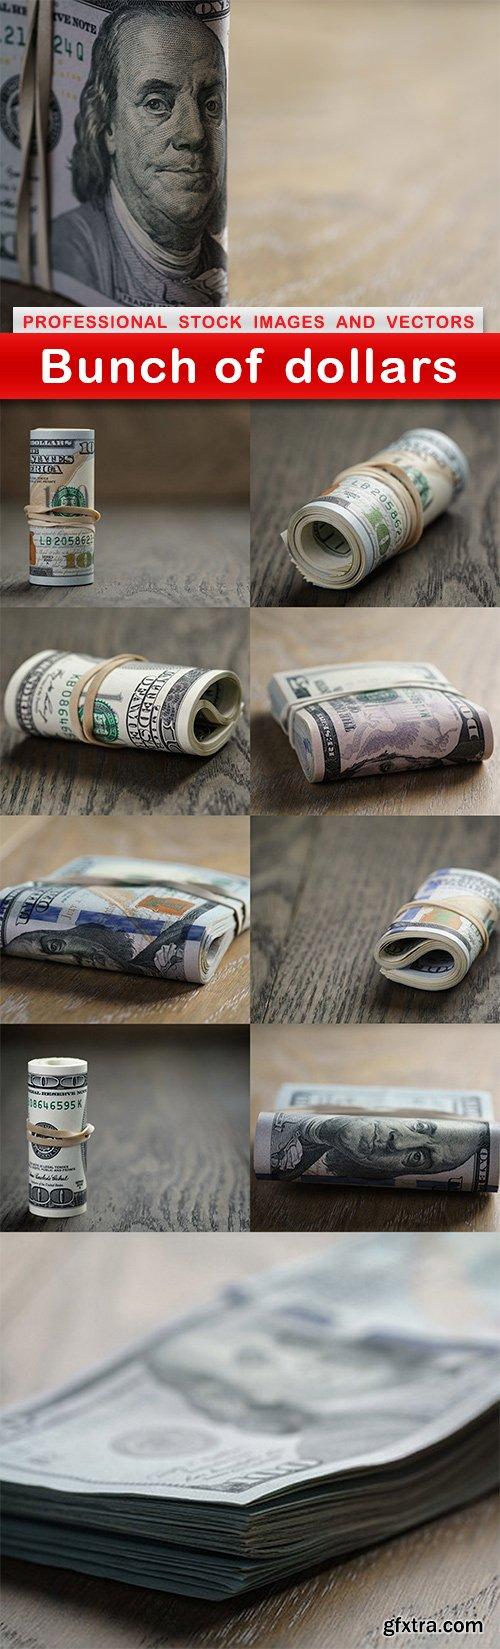 Bunch of dollars - 10 UHQ JPEG